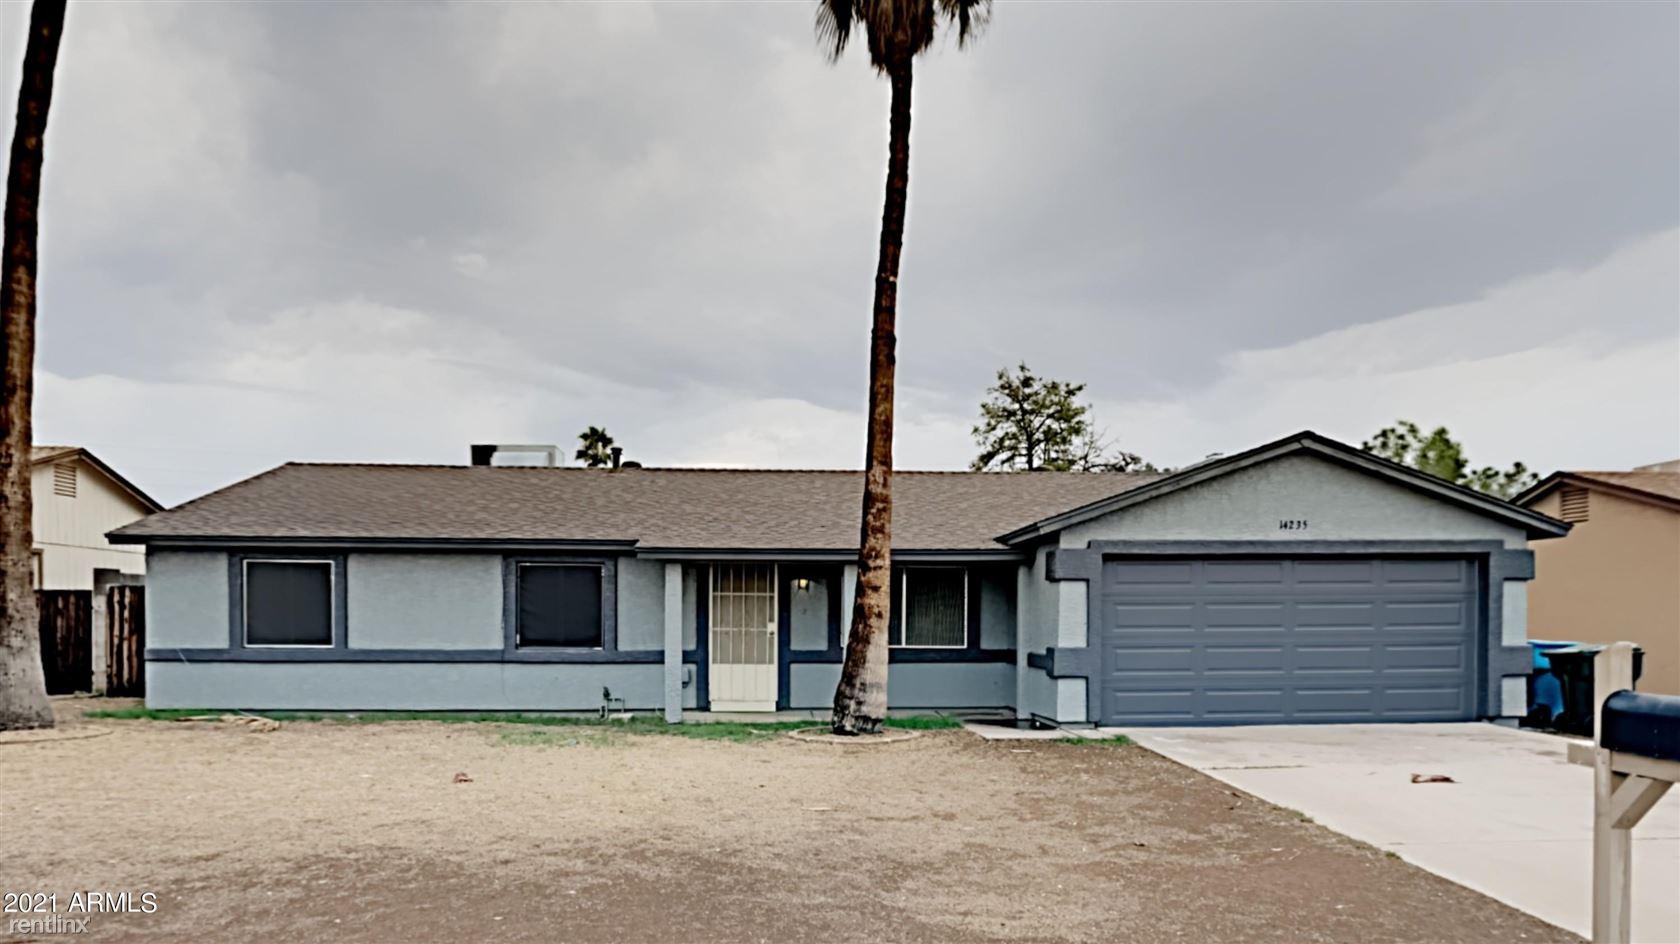 14235 N 39TH Way, Phoenix, AZ - 2,805 USD/ month